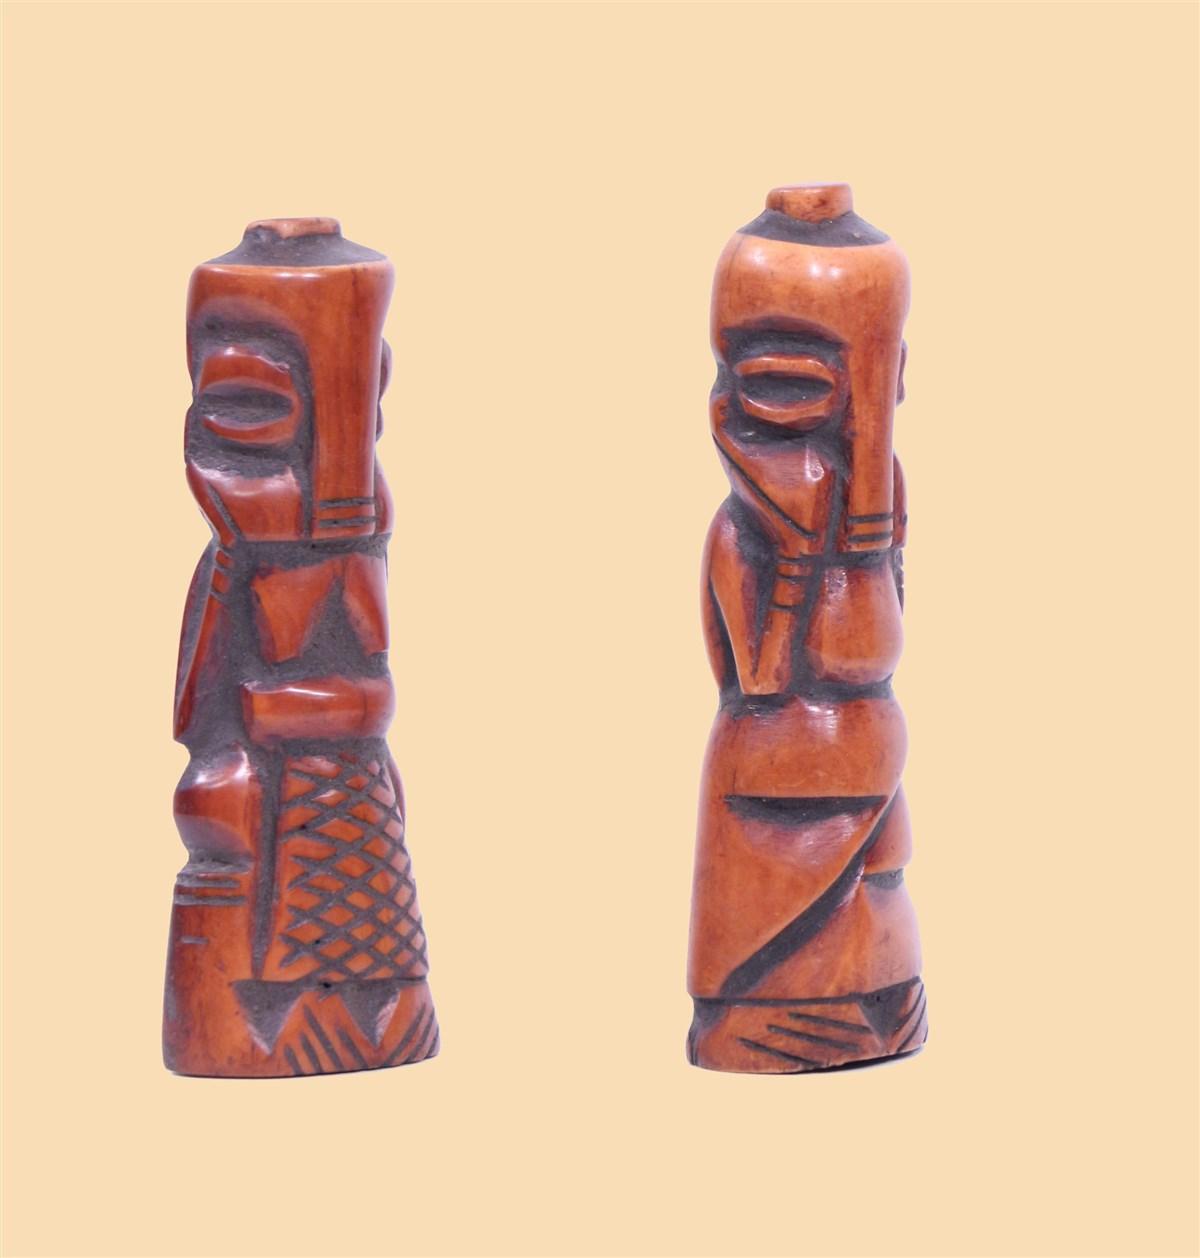 Couple Bamileke - Déco africaine - Art africain traditionnel